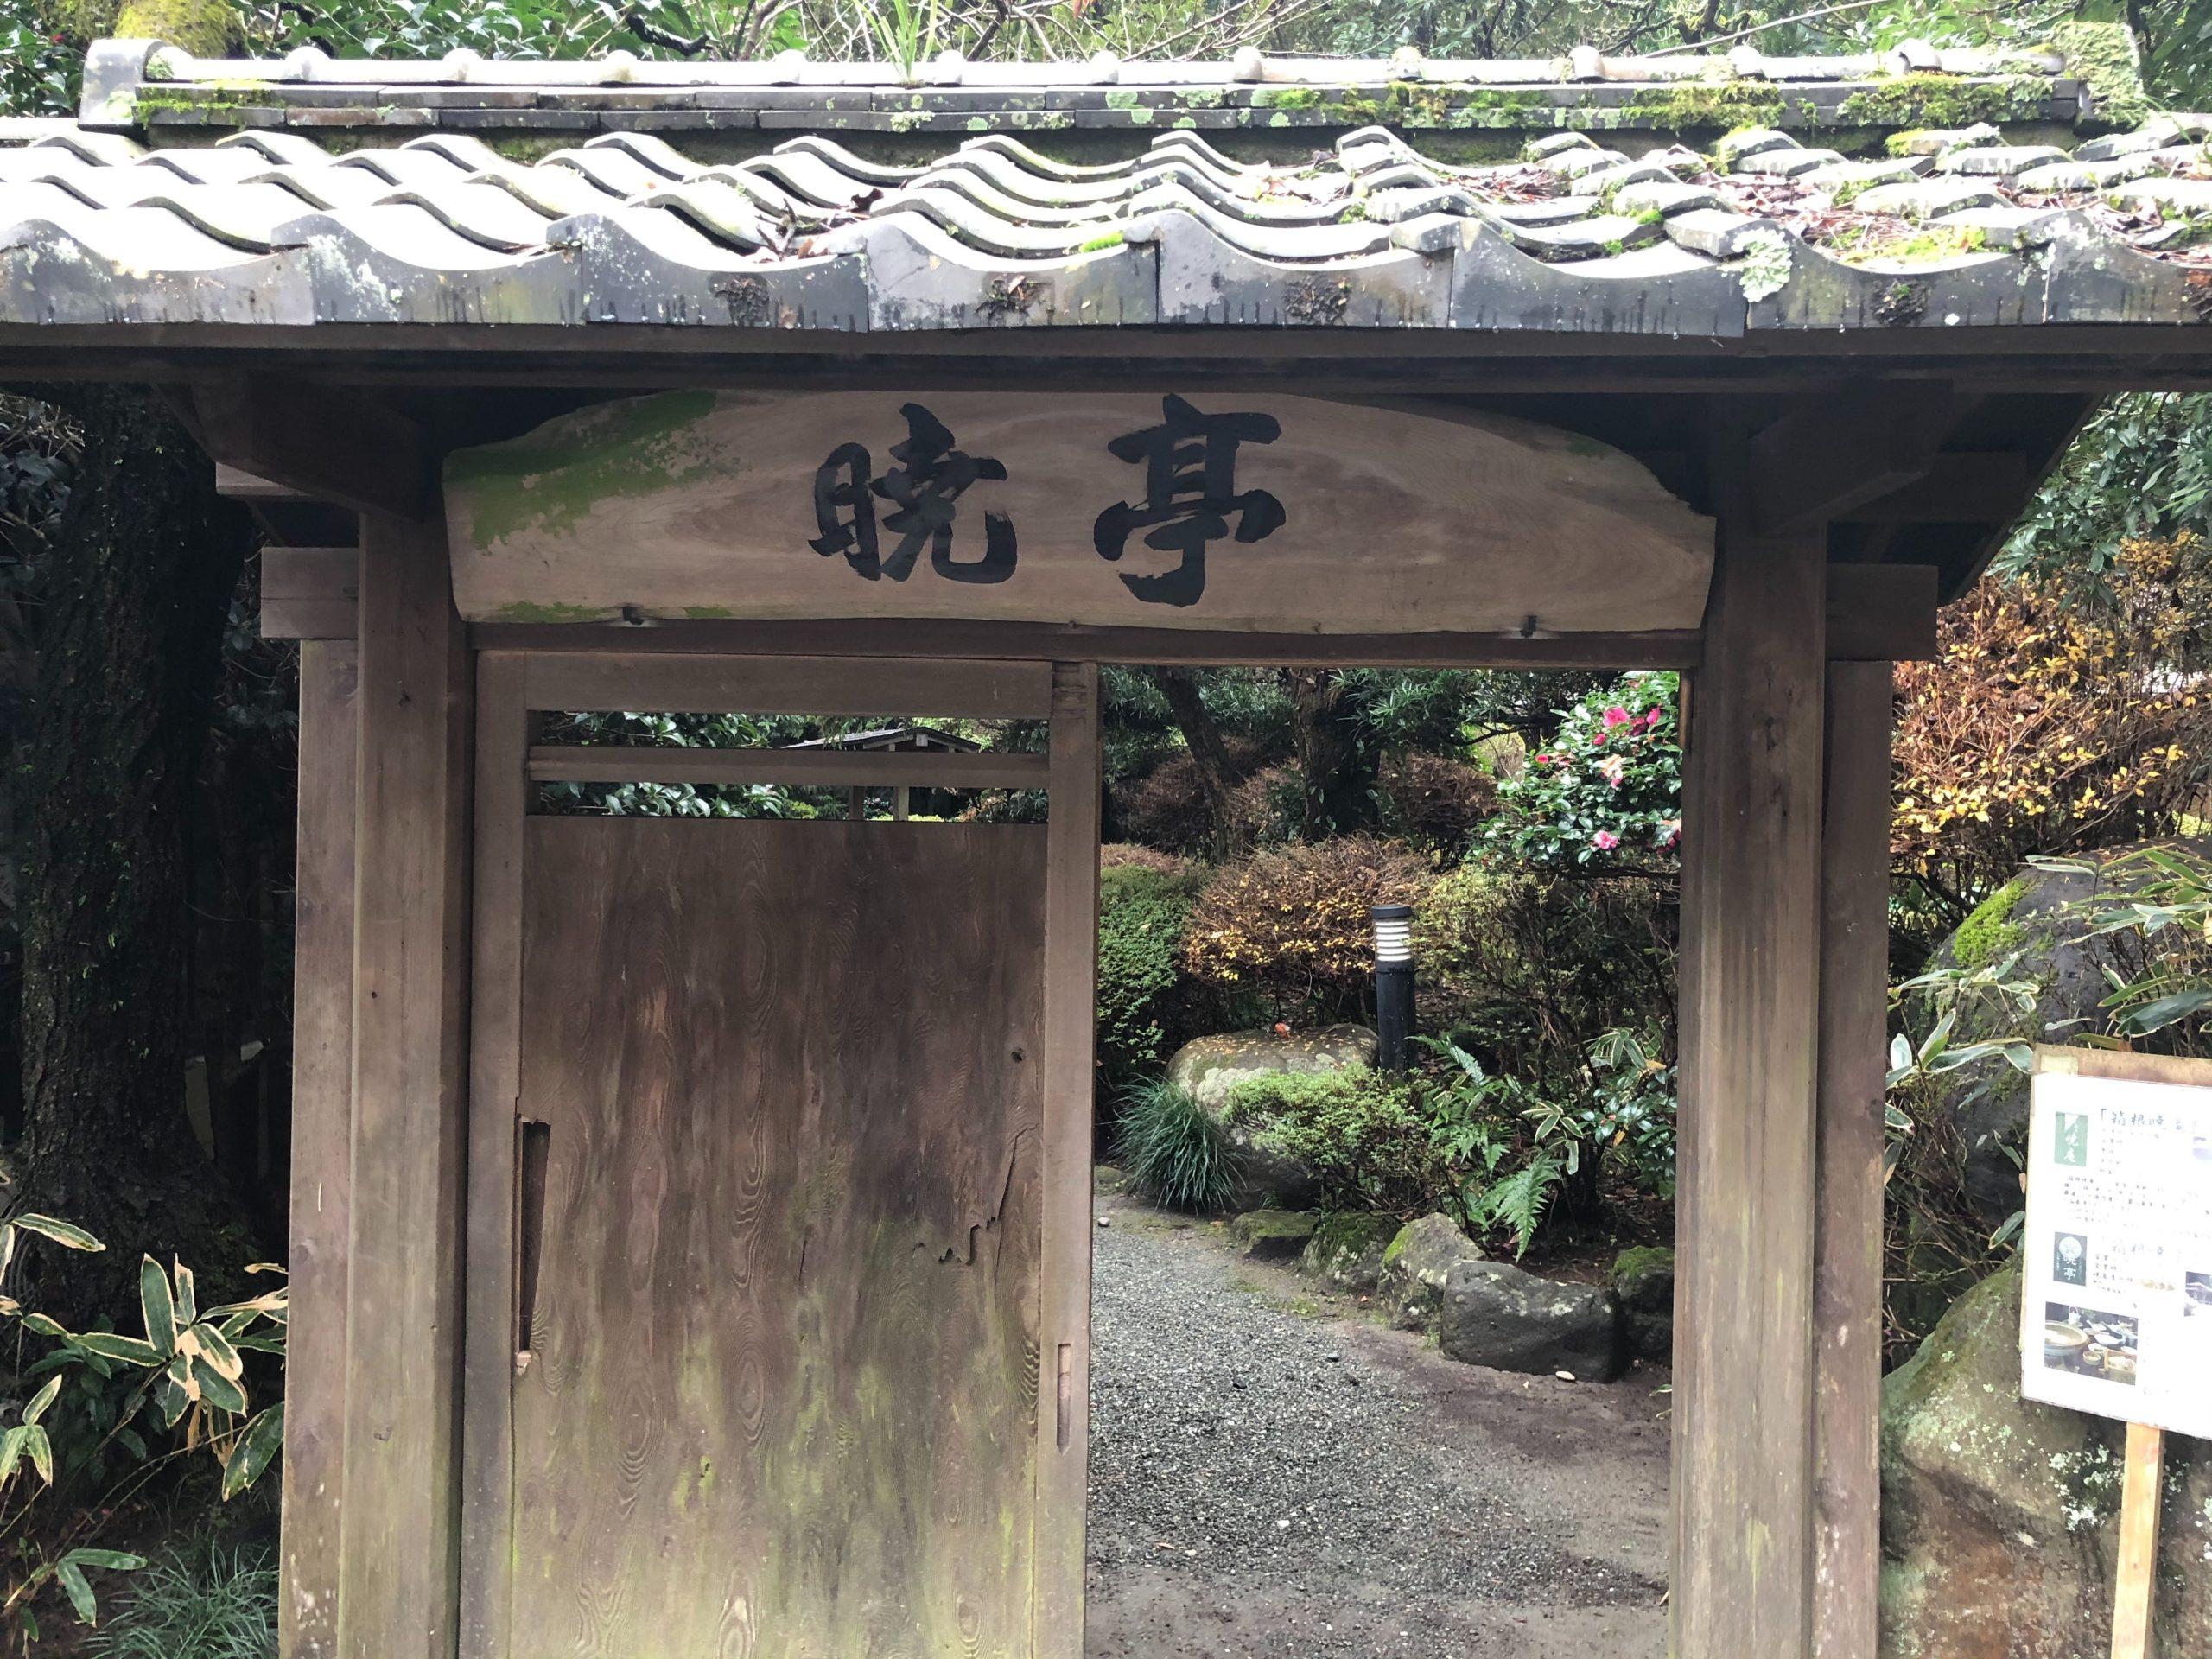 箱根暁庵箱根店の外観